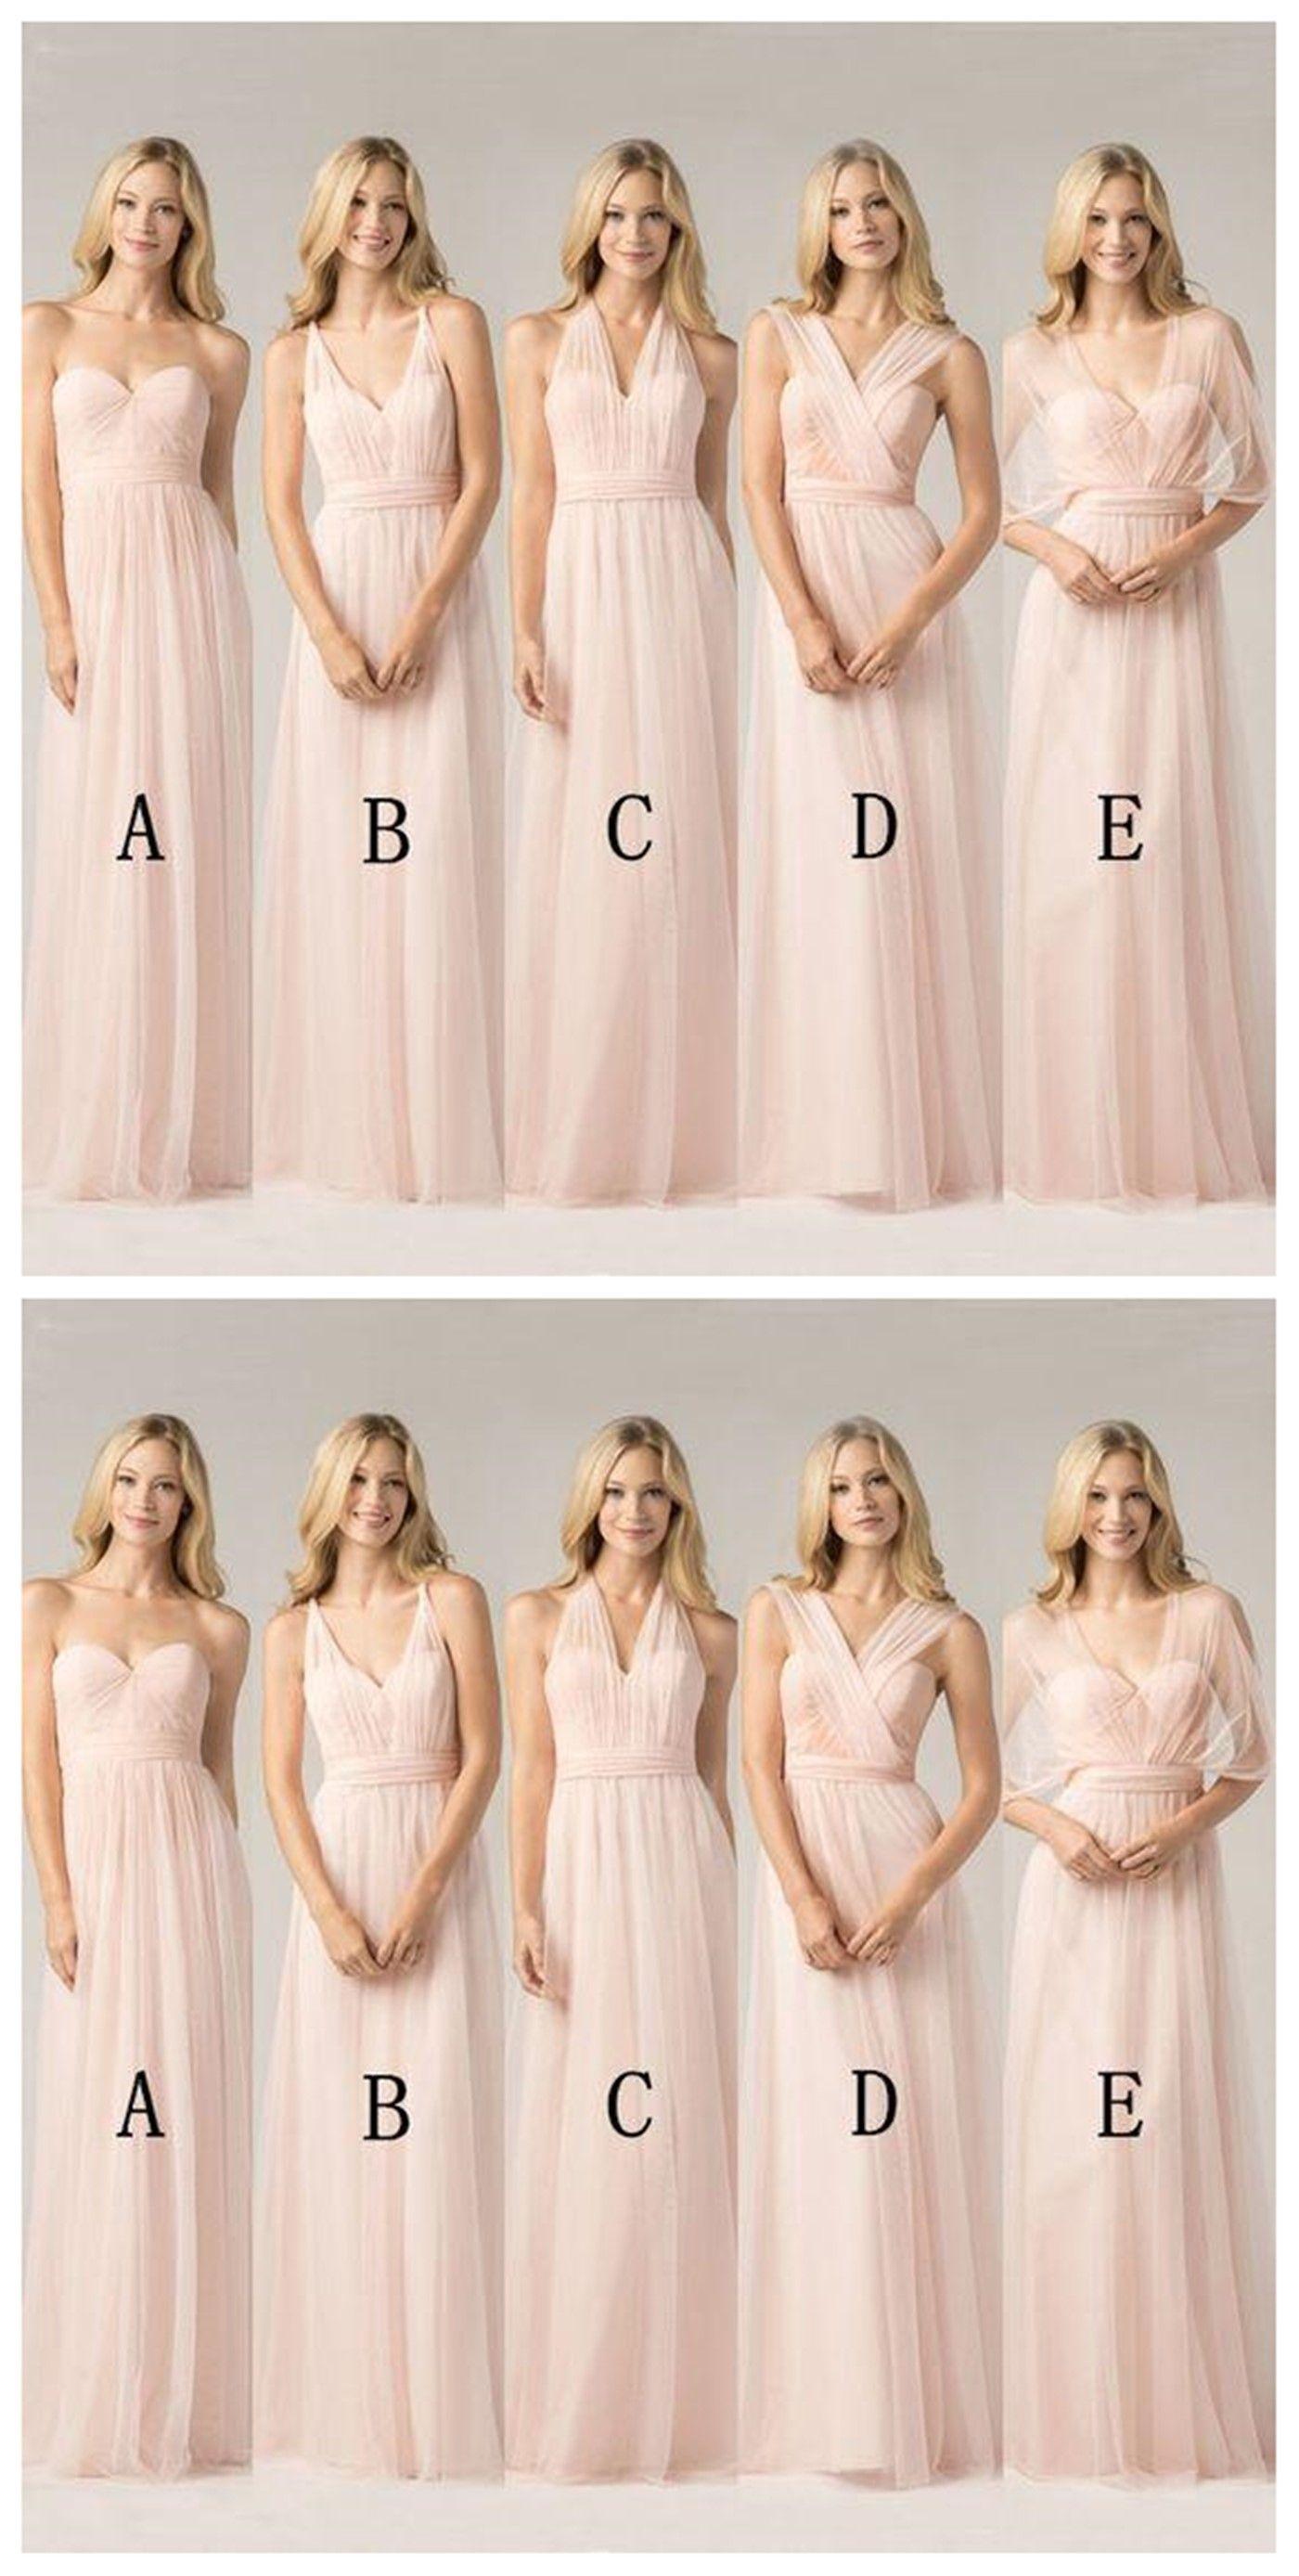 d7489b6dd3c6 Long Chiffon Blush Pink Convertible Bridesmaid Dresses, Cheap Custom 2018 Bridesmaid  Dresses, Cheap Bridesmaid Gown, WG151